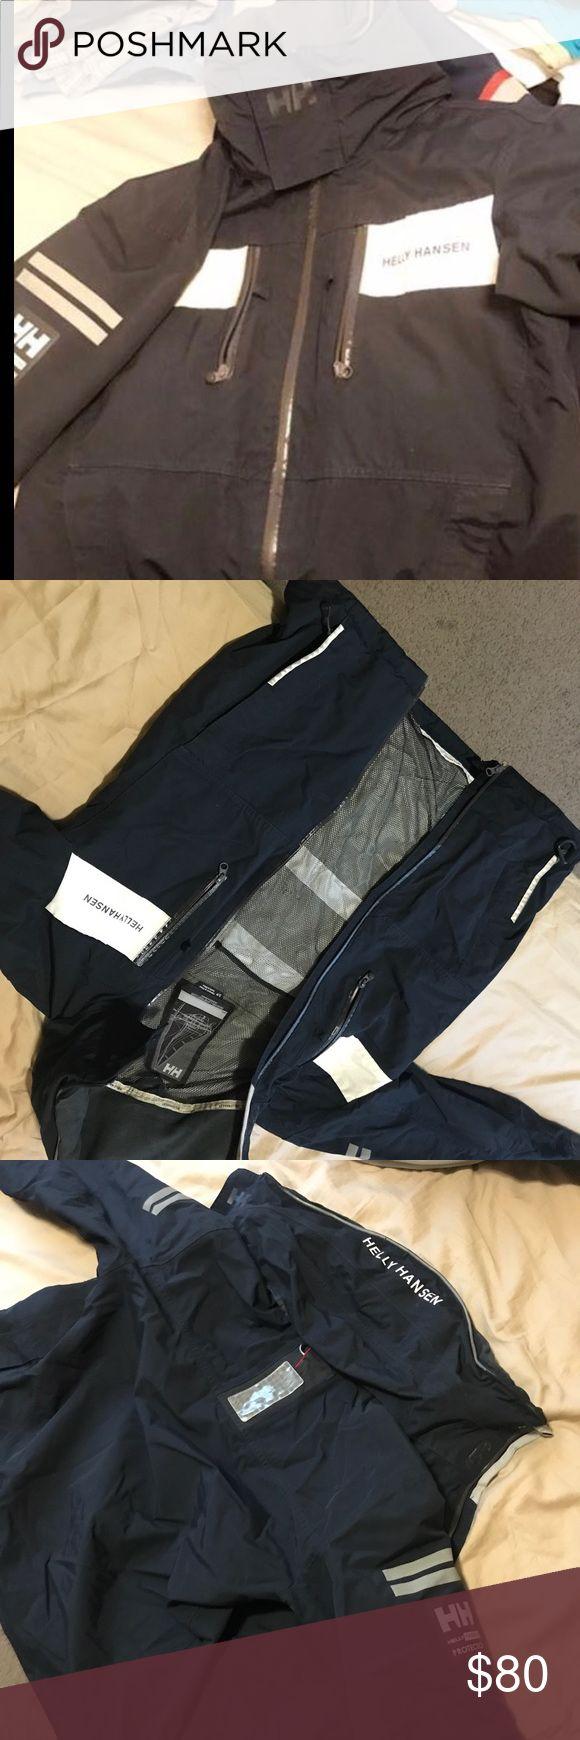 Helly Hansen jacket Size small Helly Hansen Jackets & Coats